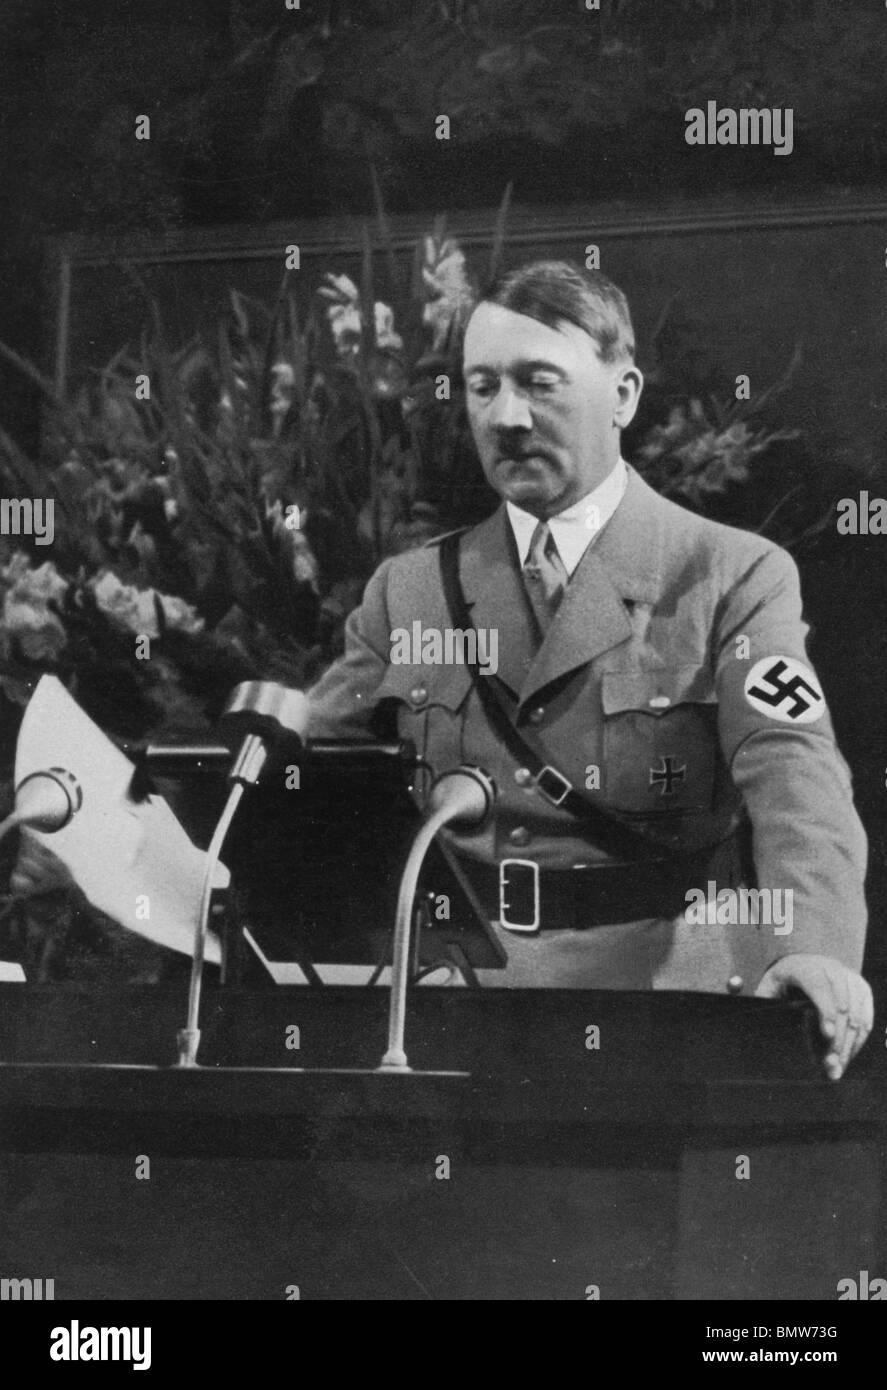 ADOLF HITLER opens 1935 Nazi Party Congress in Nuremberg - Stock Image